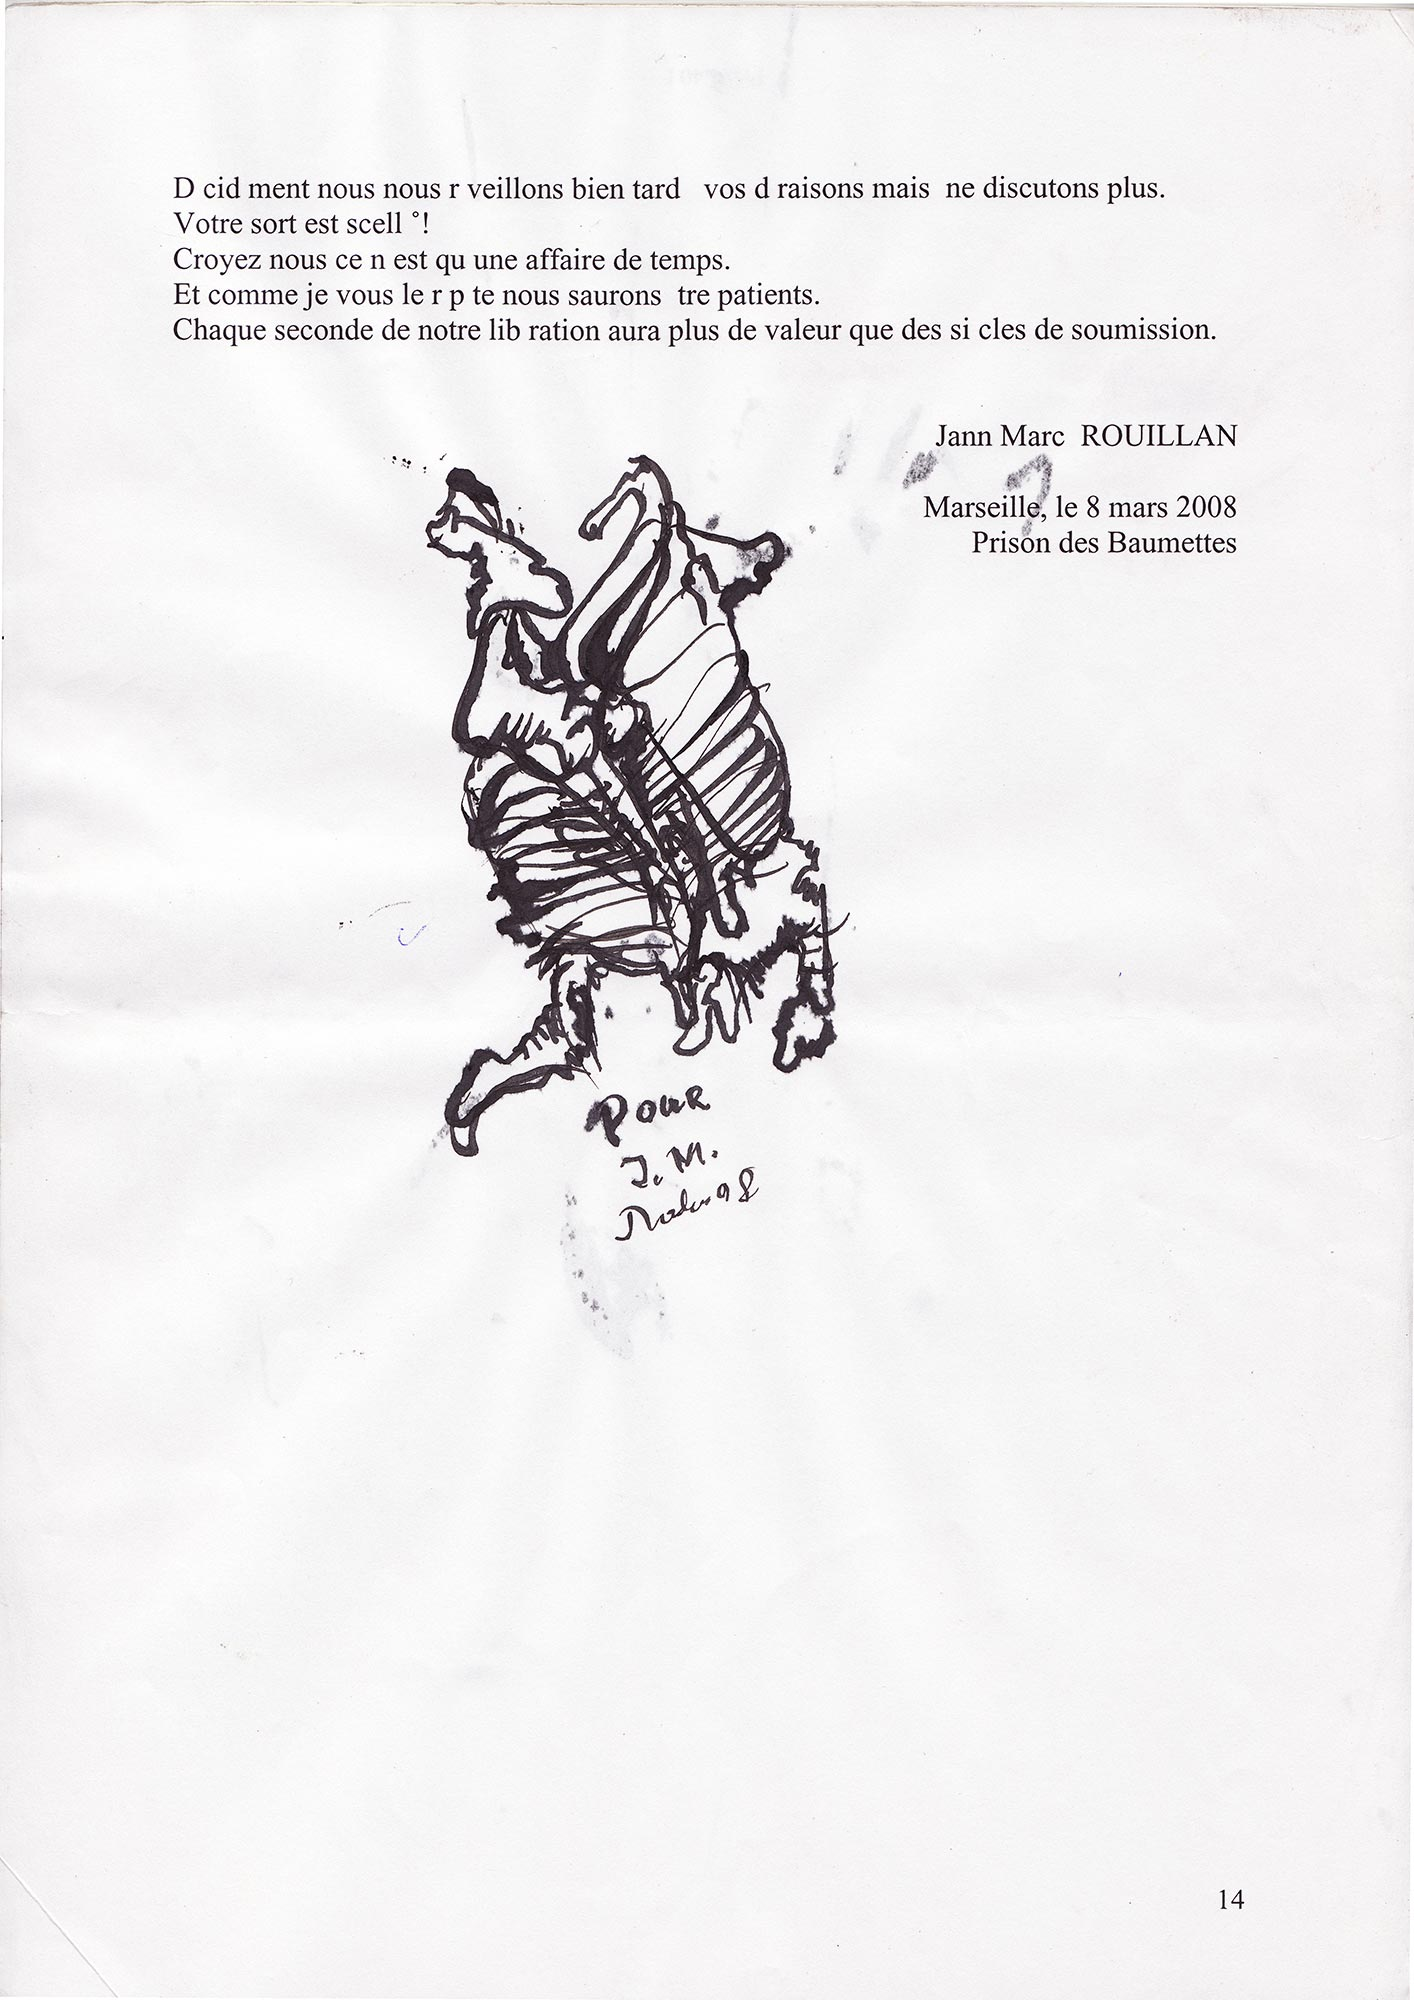 Jann-Marc Rouillan's manuscript - Page 14